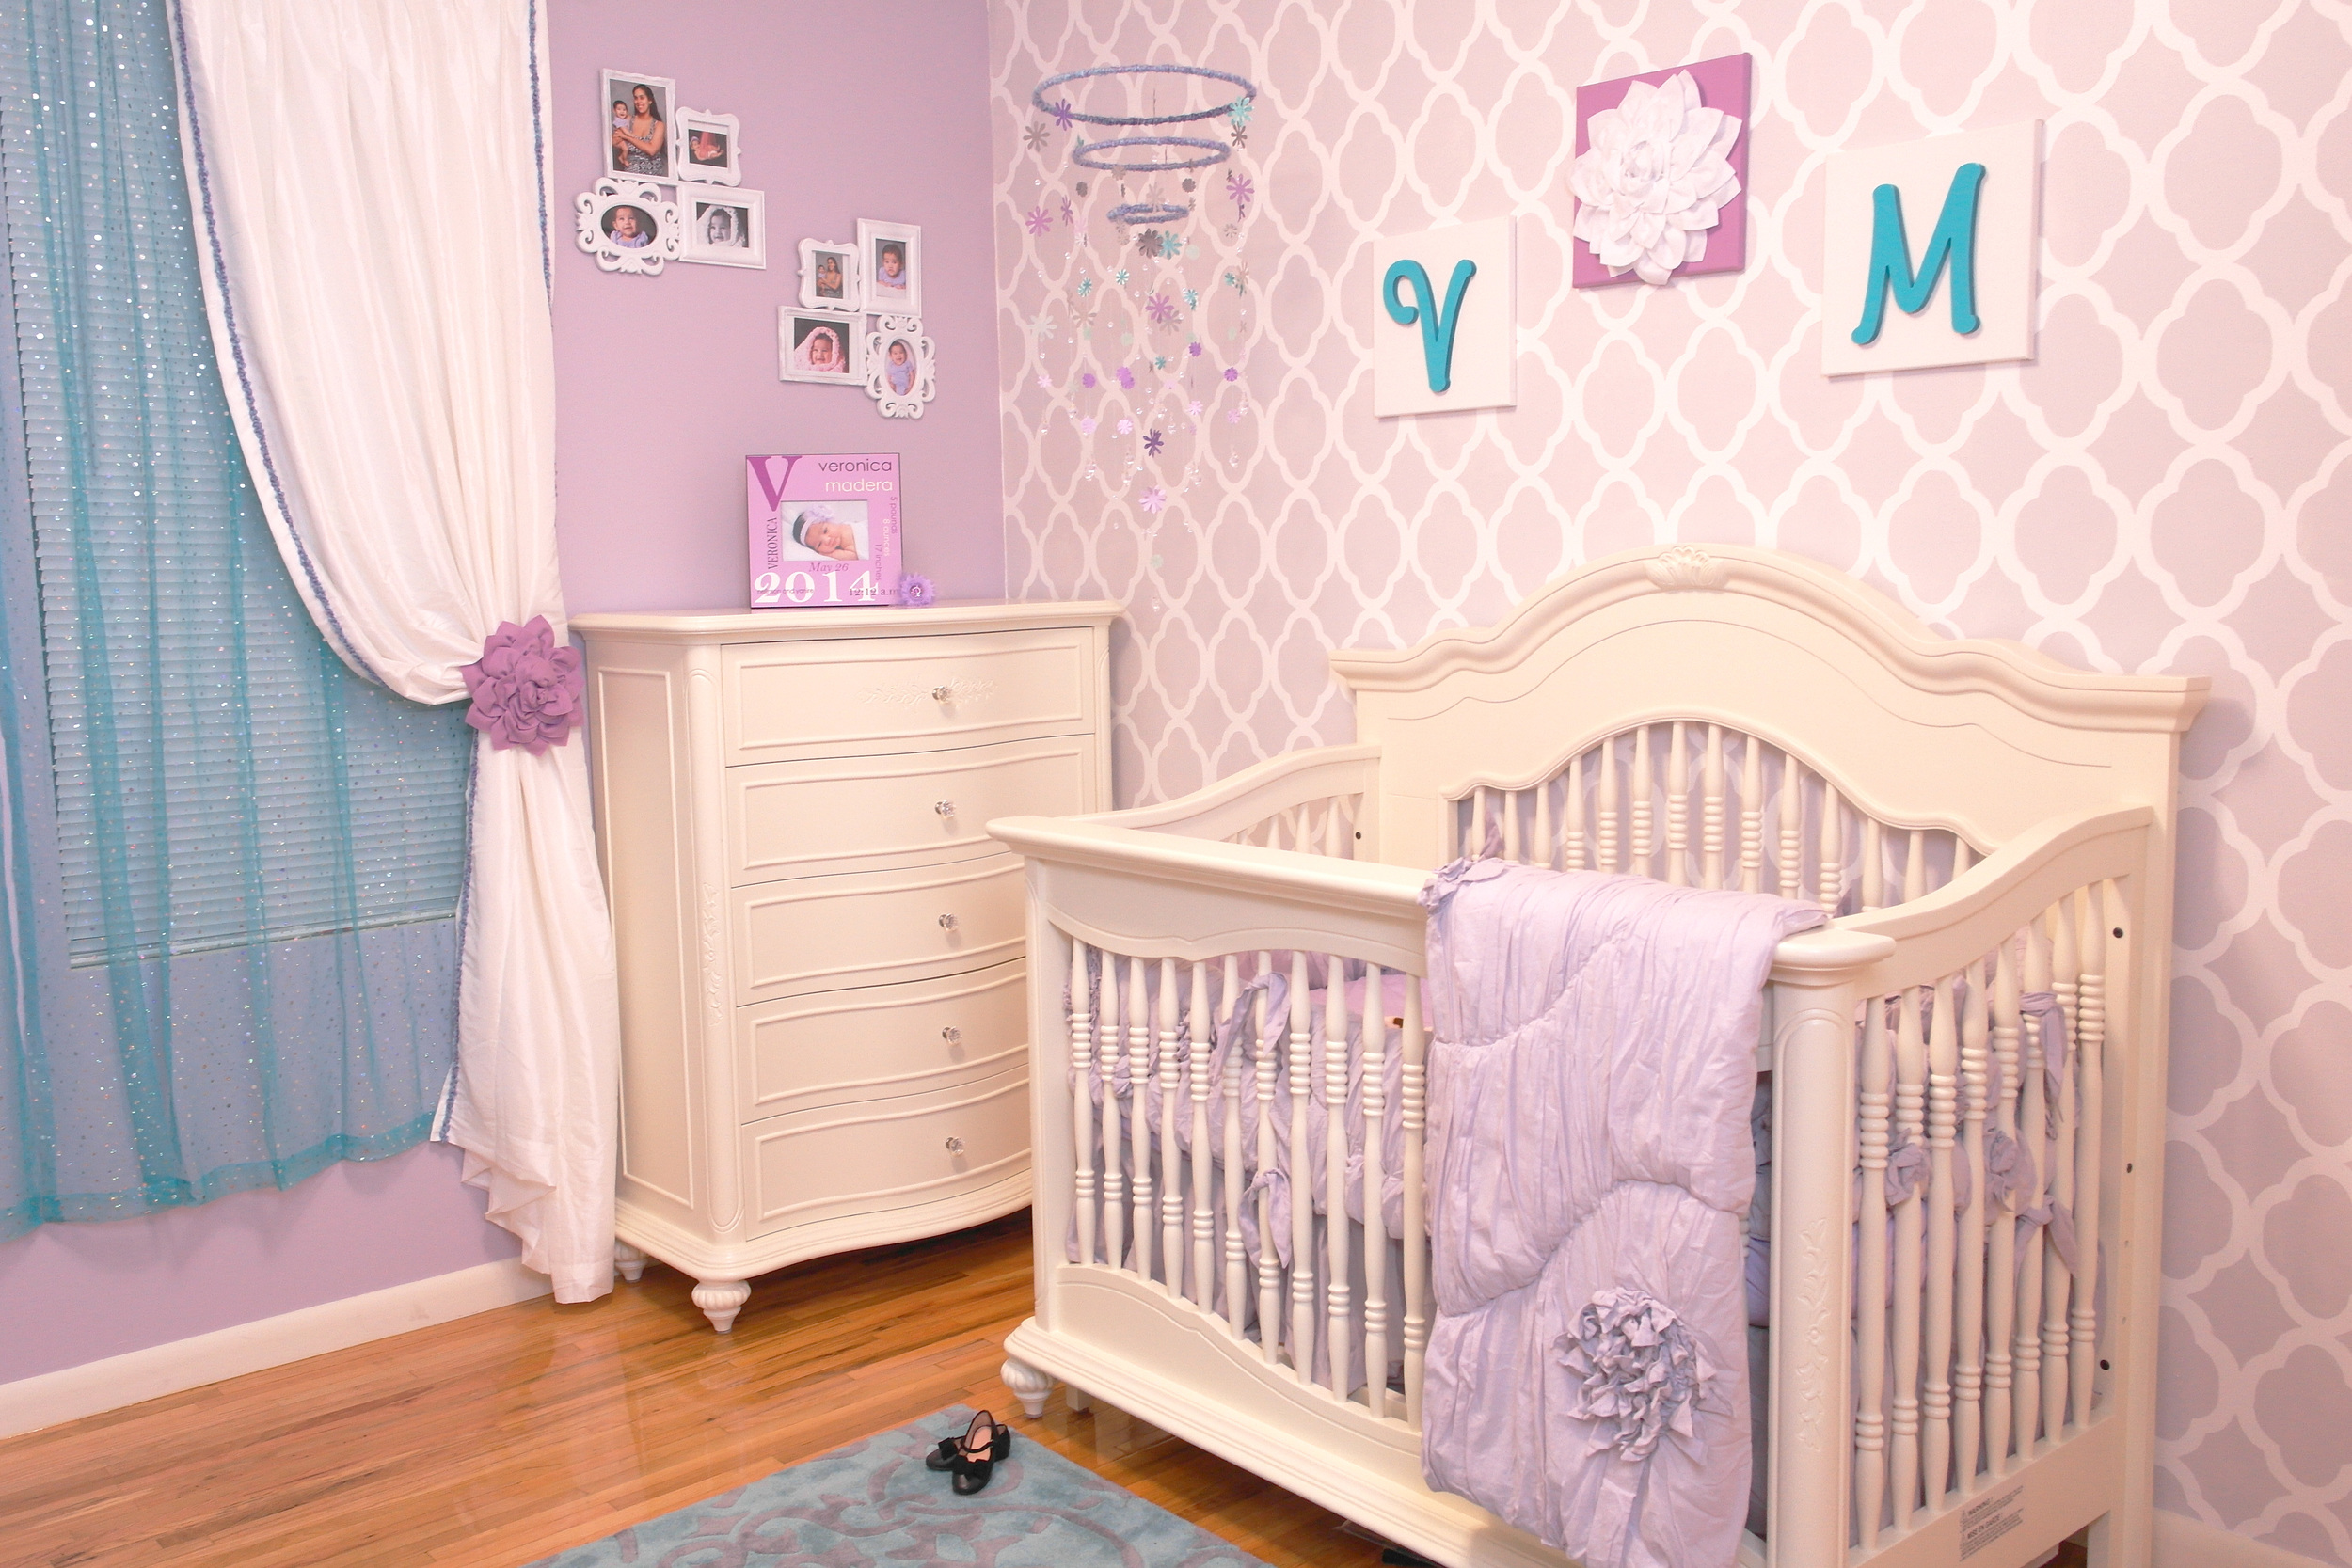 Amelias-Decorating-and-Design-New-Jersey-Interior-Design-Baby-Veroncia-Nursery-Design-Purple-and-Teal-Nursery-design.jpg